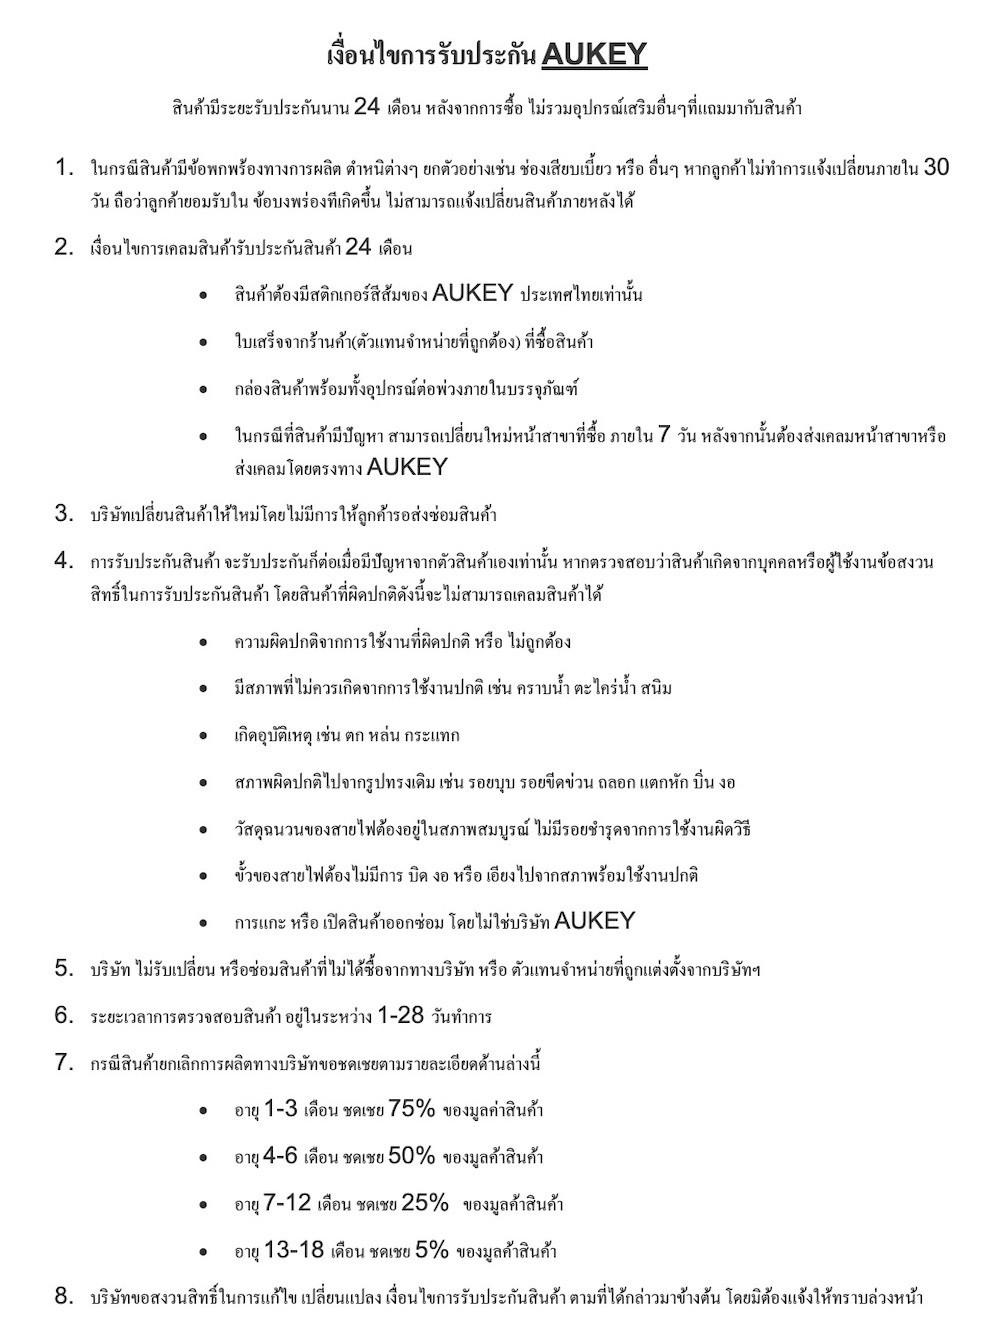 warrantyaukey-1.jpg